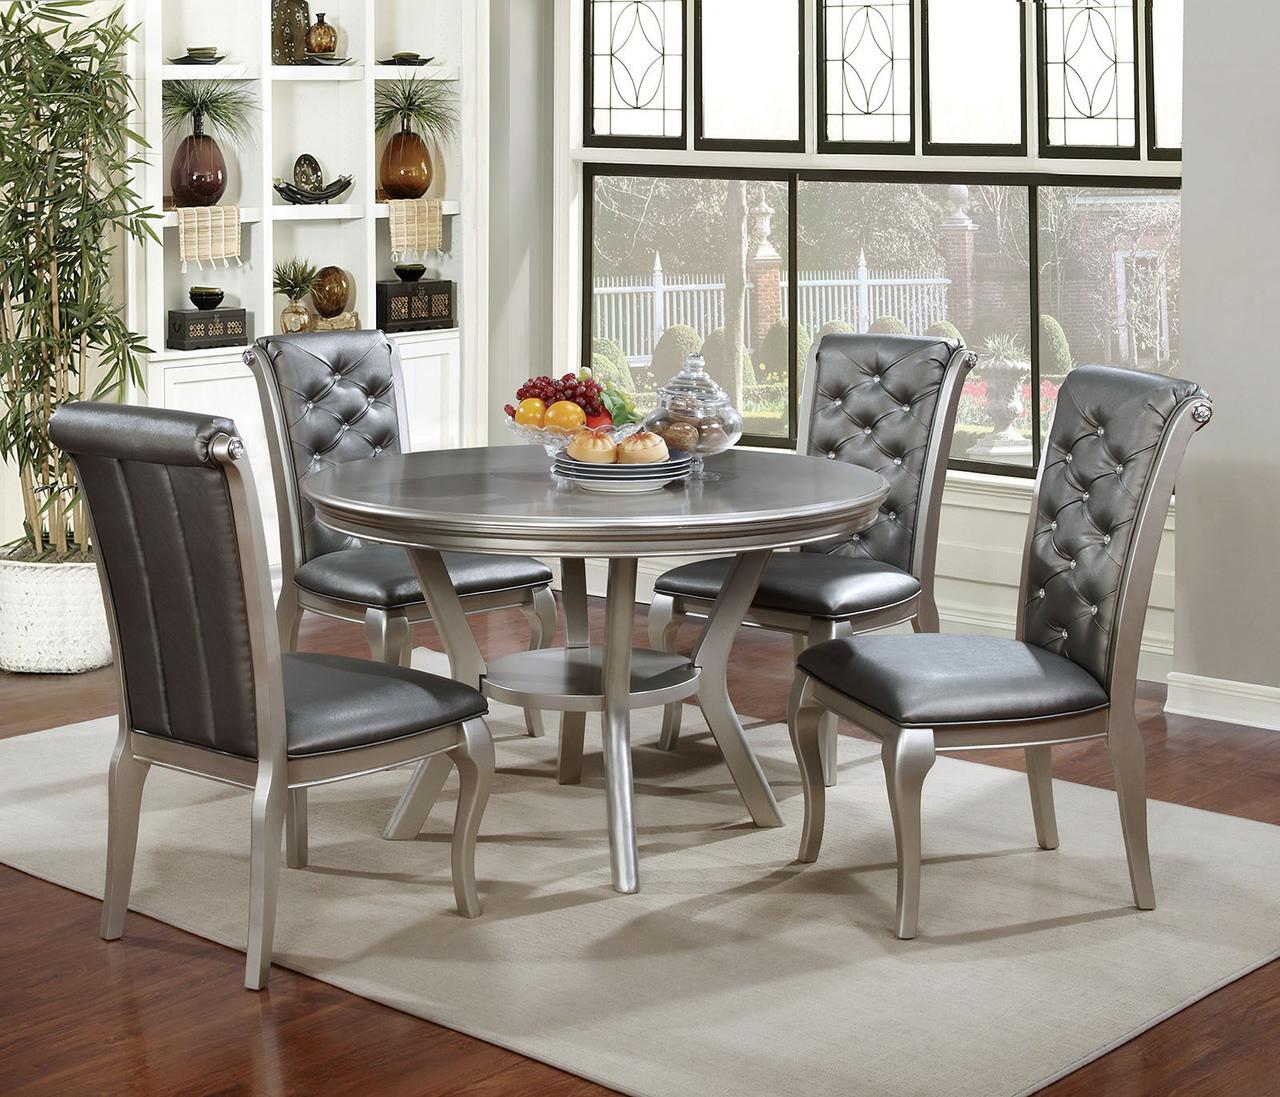 Furniture Of America Cm3219rt Round Dining Set